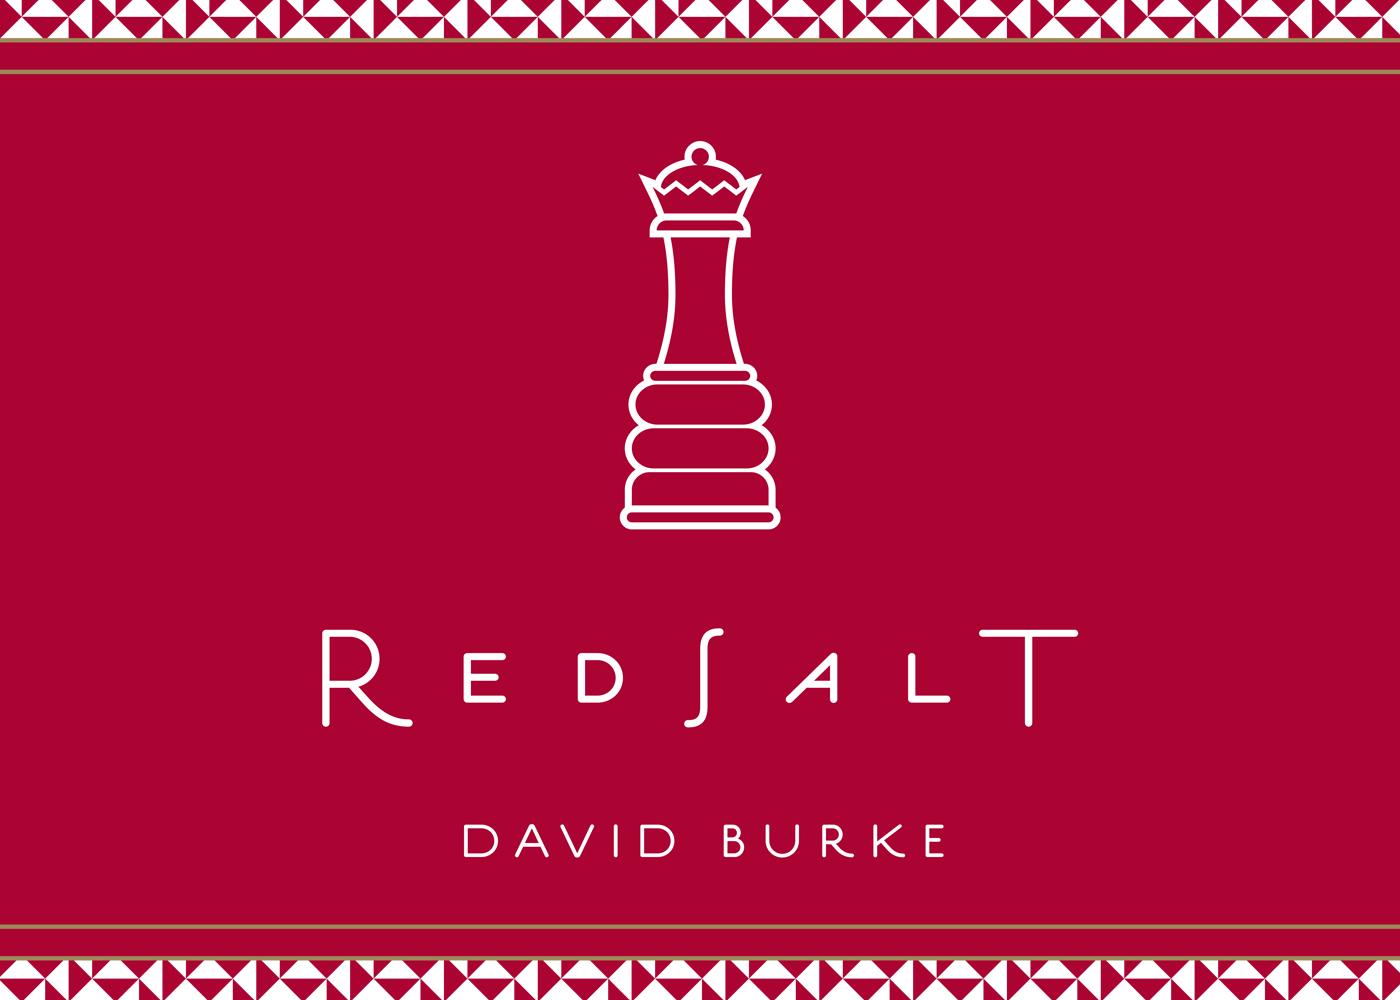 Red Salt by David Burke